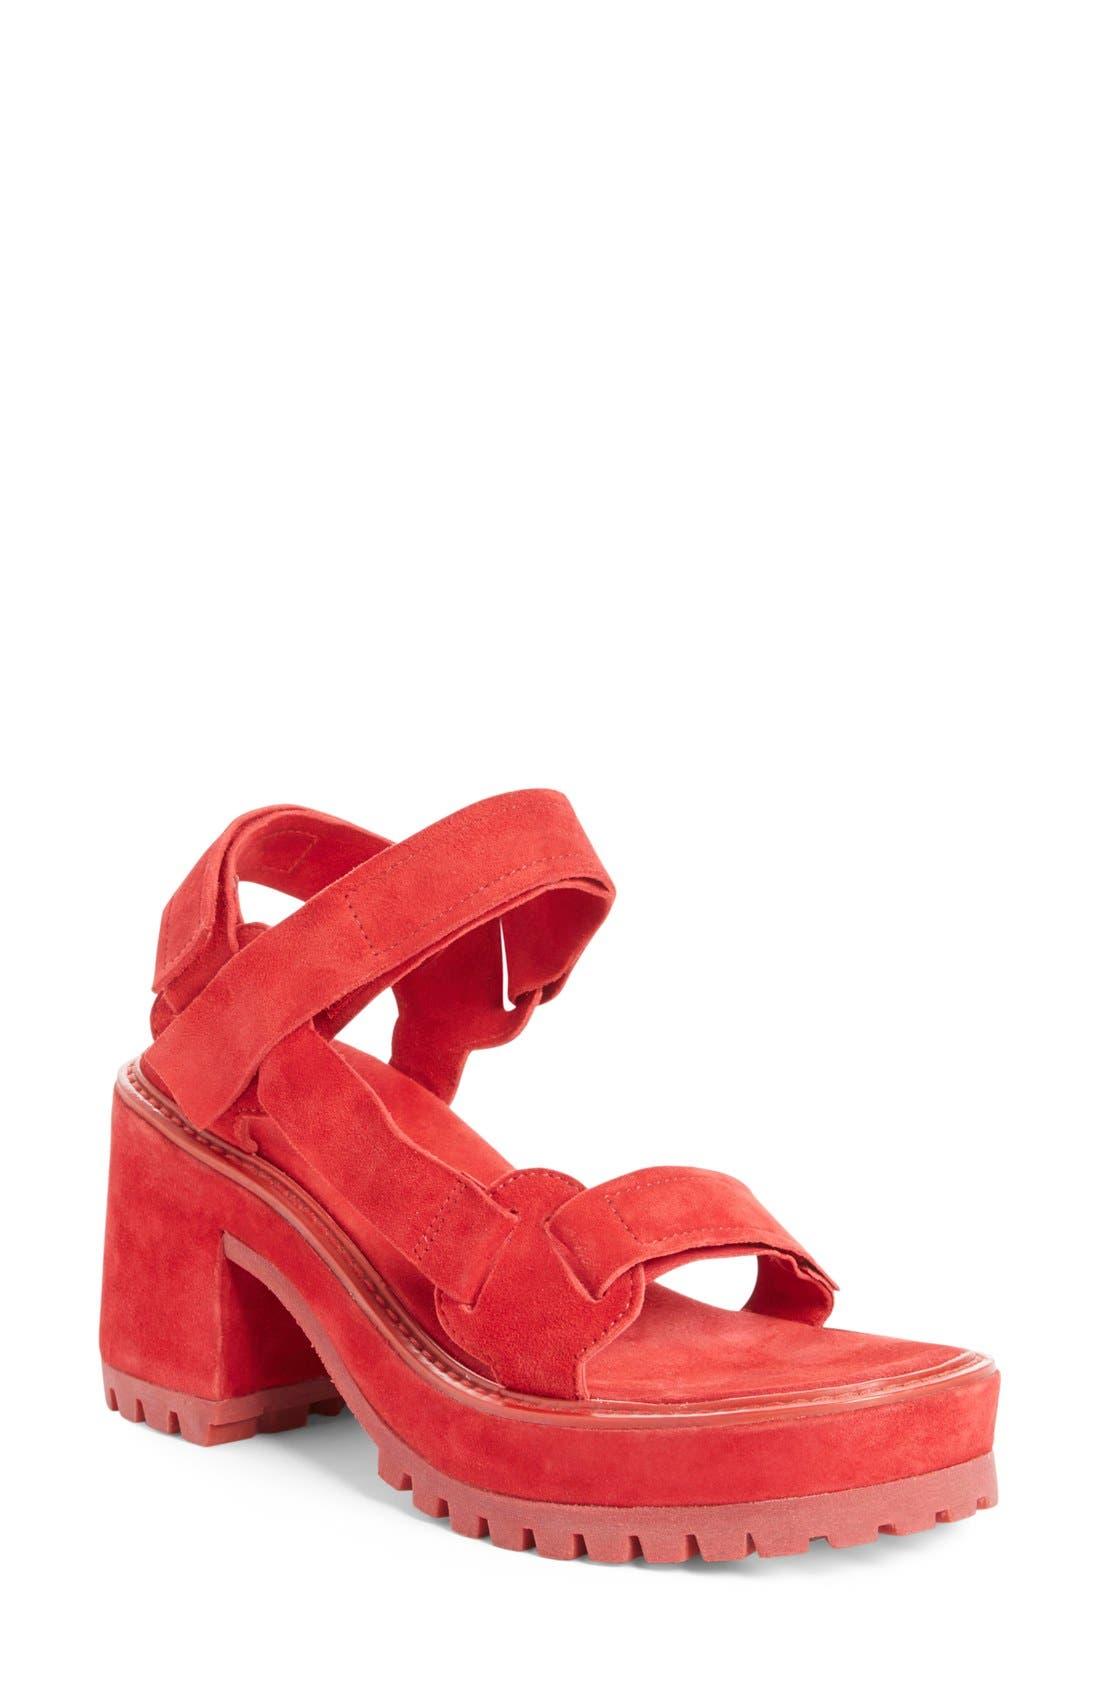 Main Image - Marques'Almeida Chunky Heel Sandal (Women)